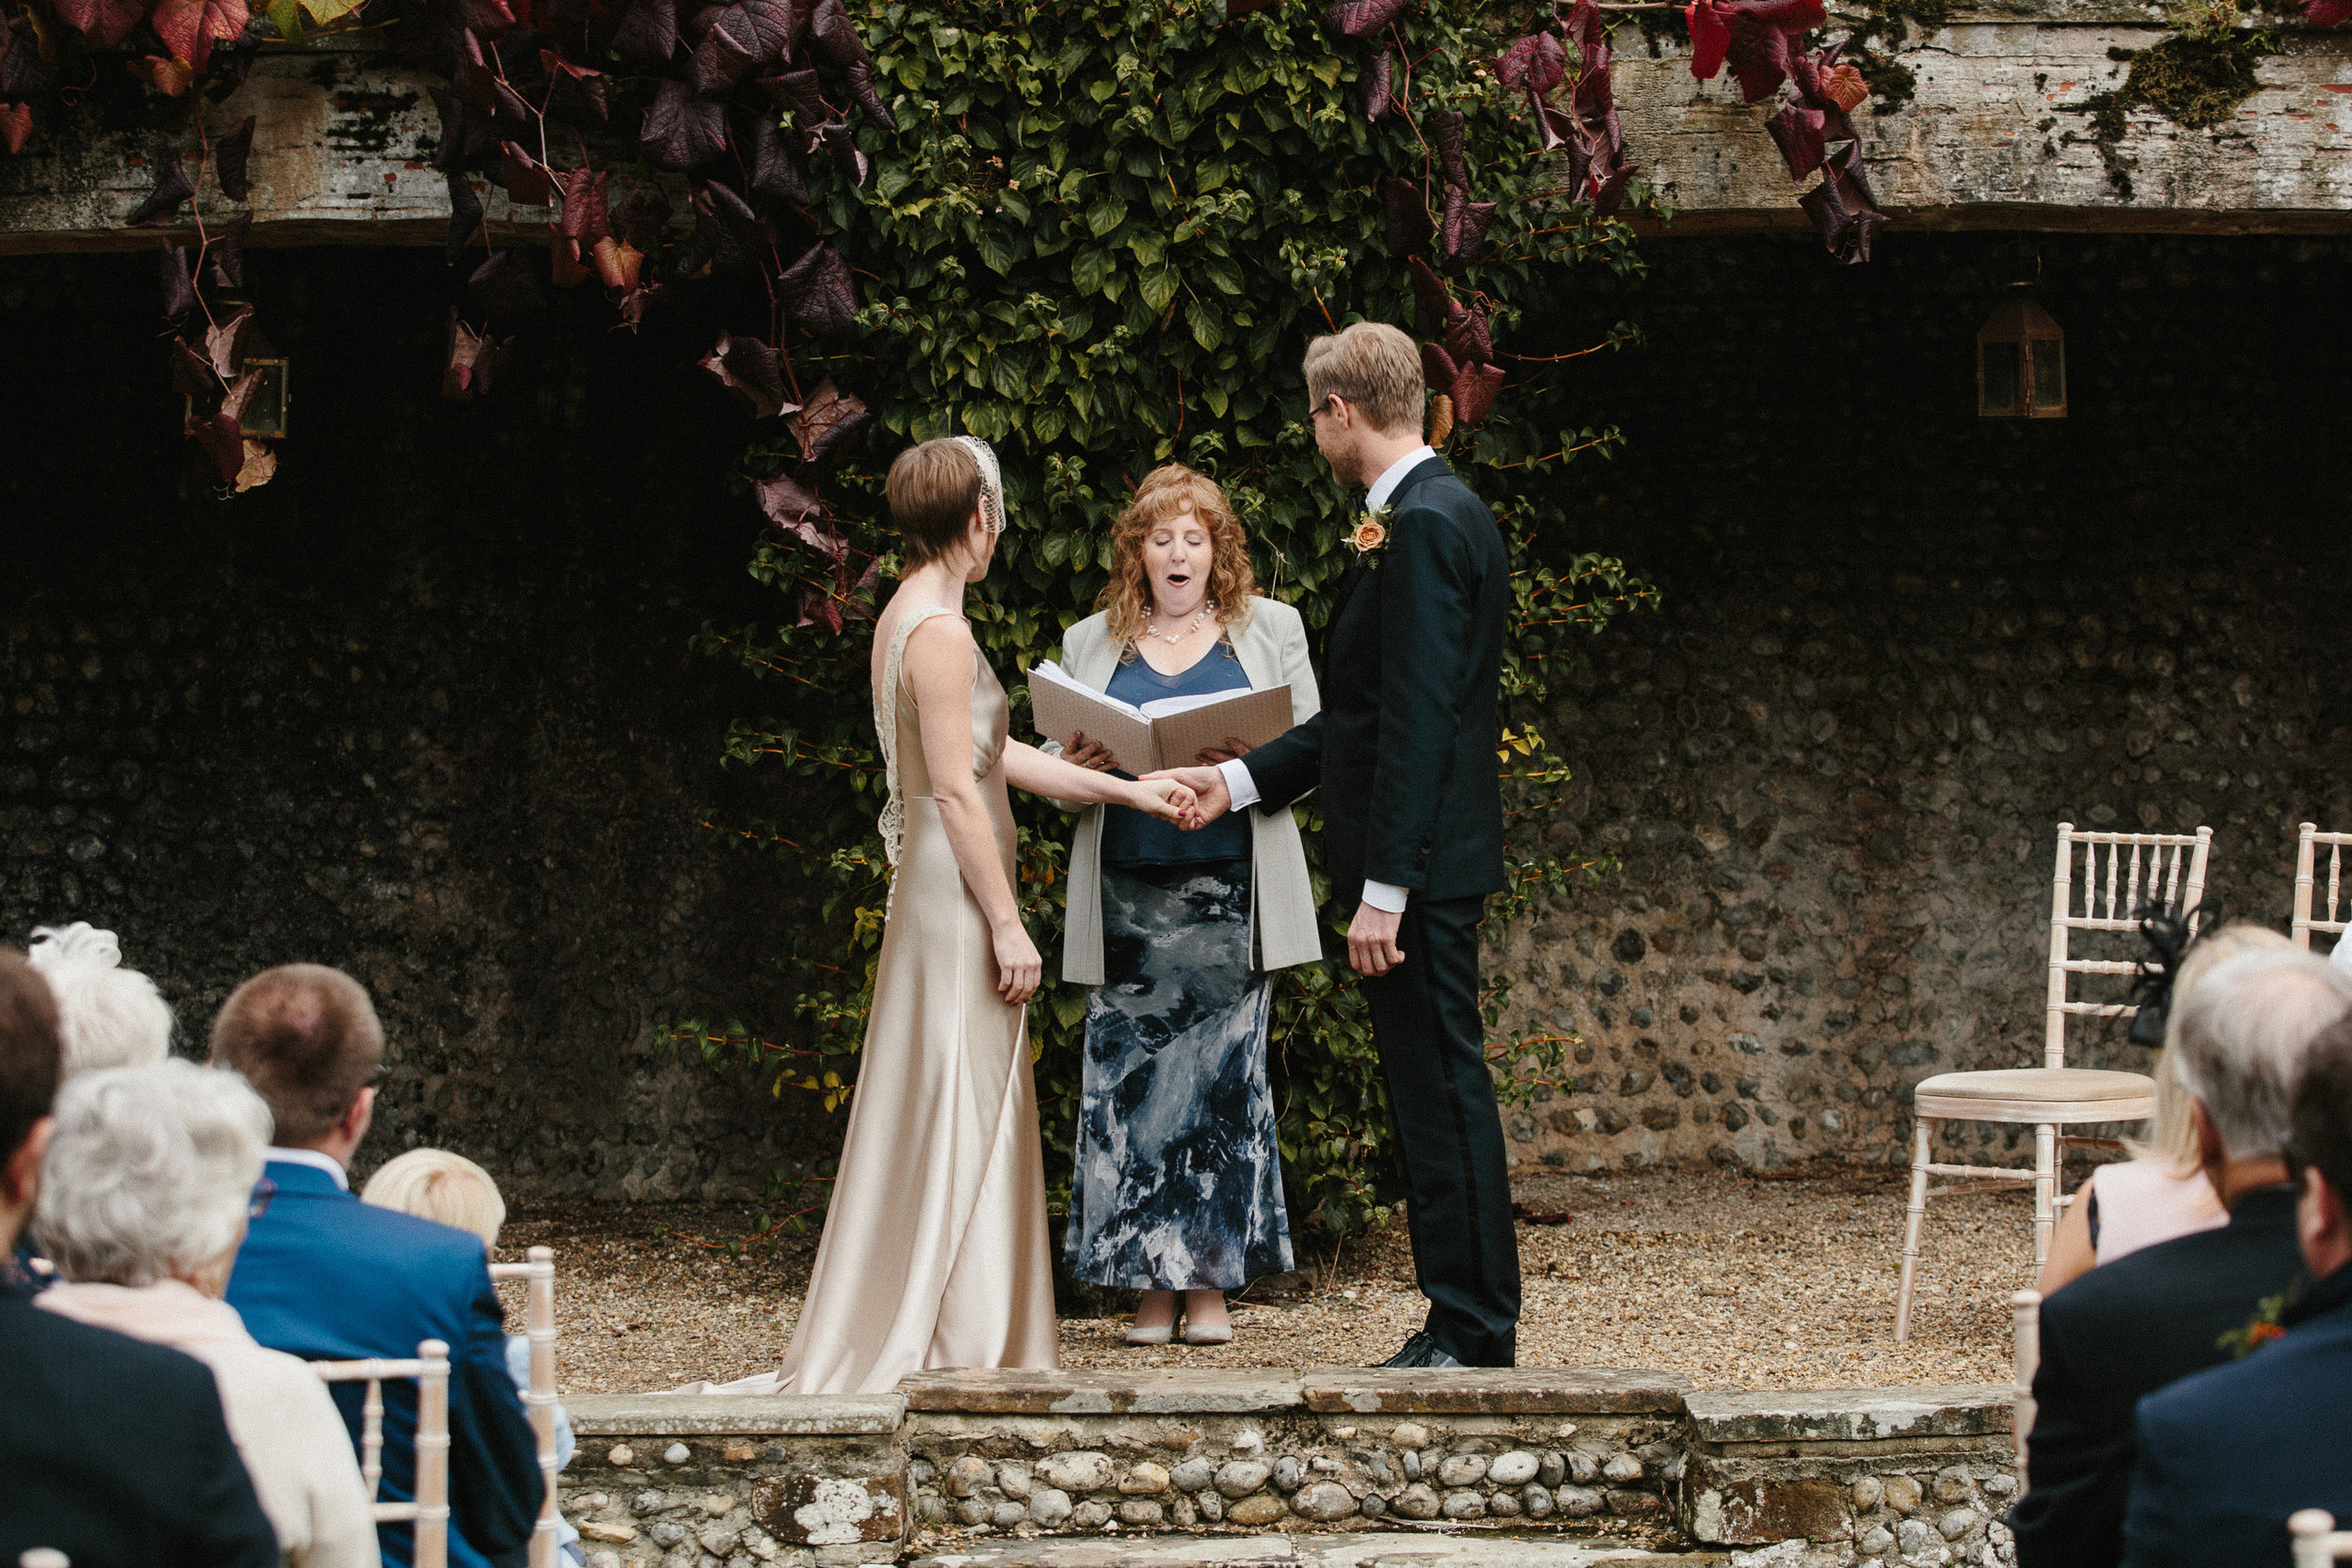 Kate-Beaumont-Sheffield-Honeysuckle-bias-cut-wedding-dress-oyster-Rosie7.jpg